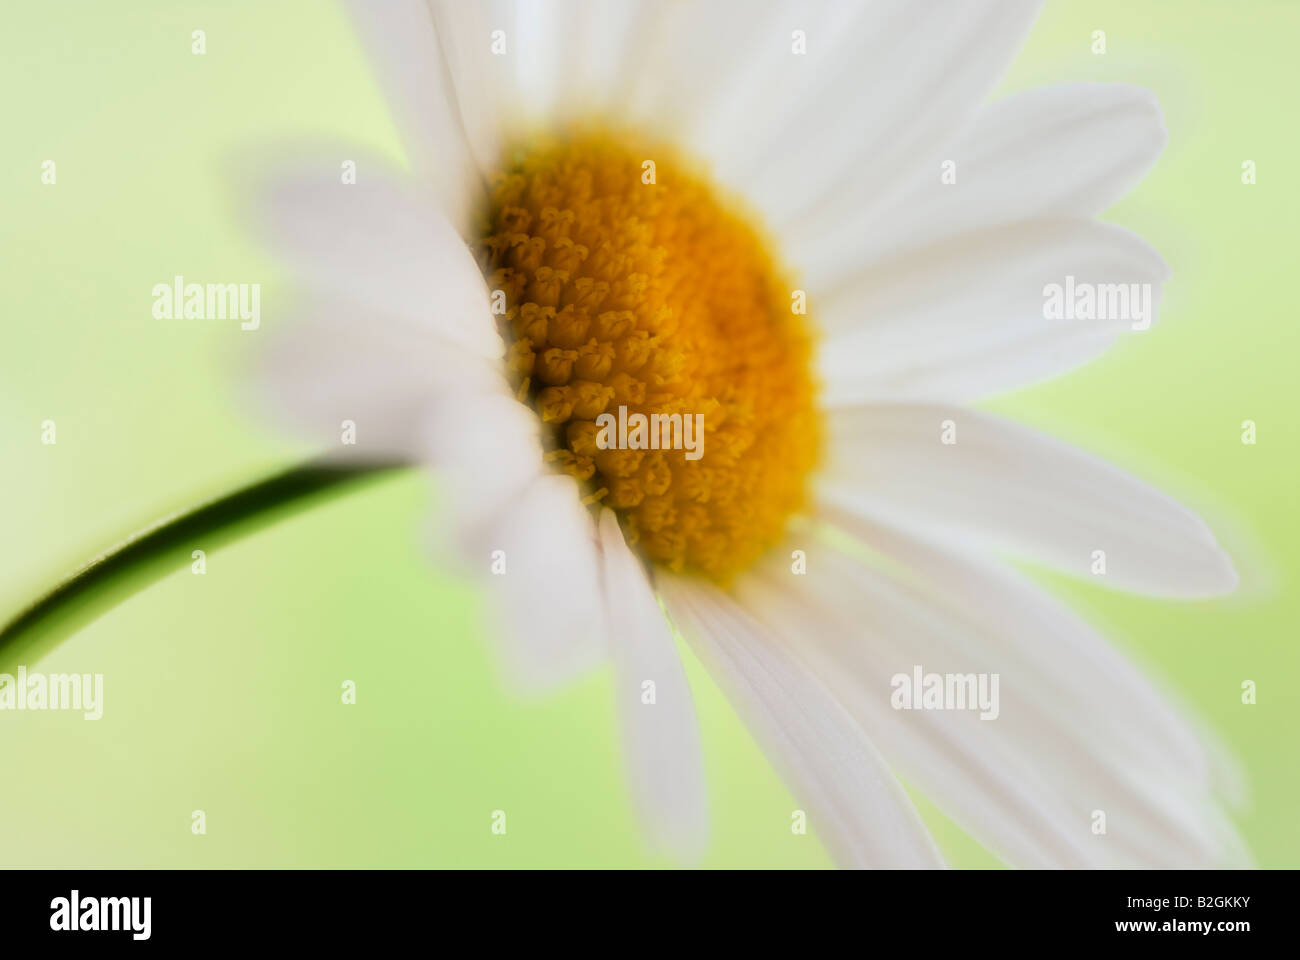 Oxeye daisy Leucanthemum vulgare plante en fleurs fleur fleurs fond photos encore patterns patterns c Photo Stock